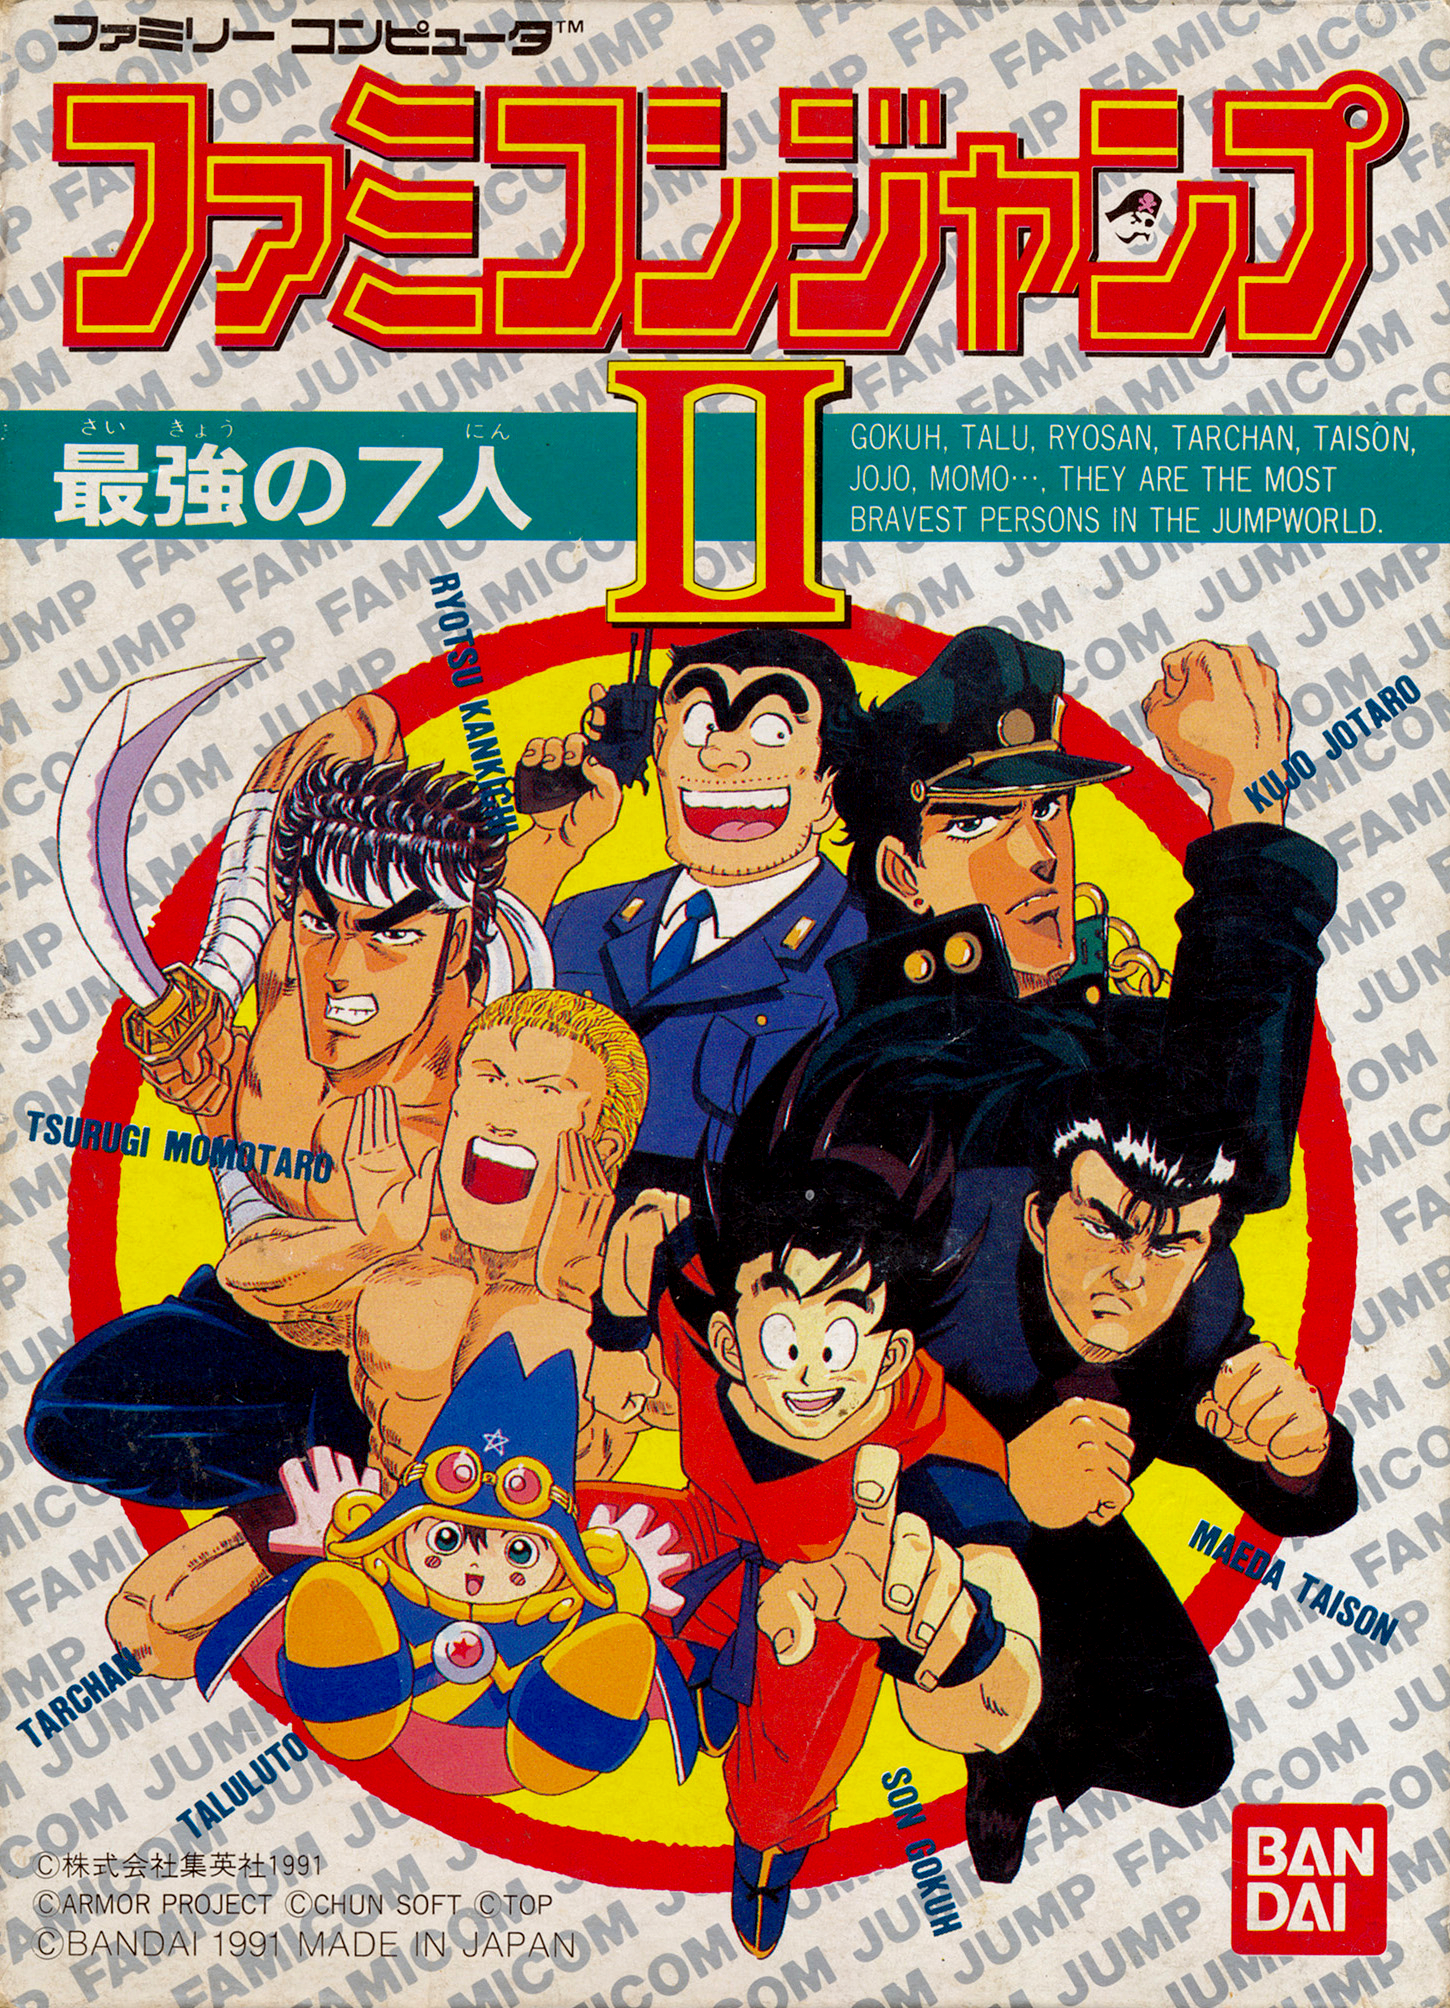 Famicom Jump II Saikyo no Shichinin Cover.jpg